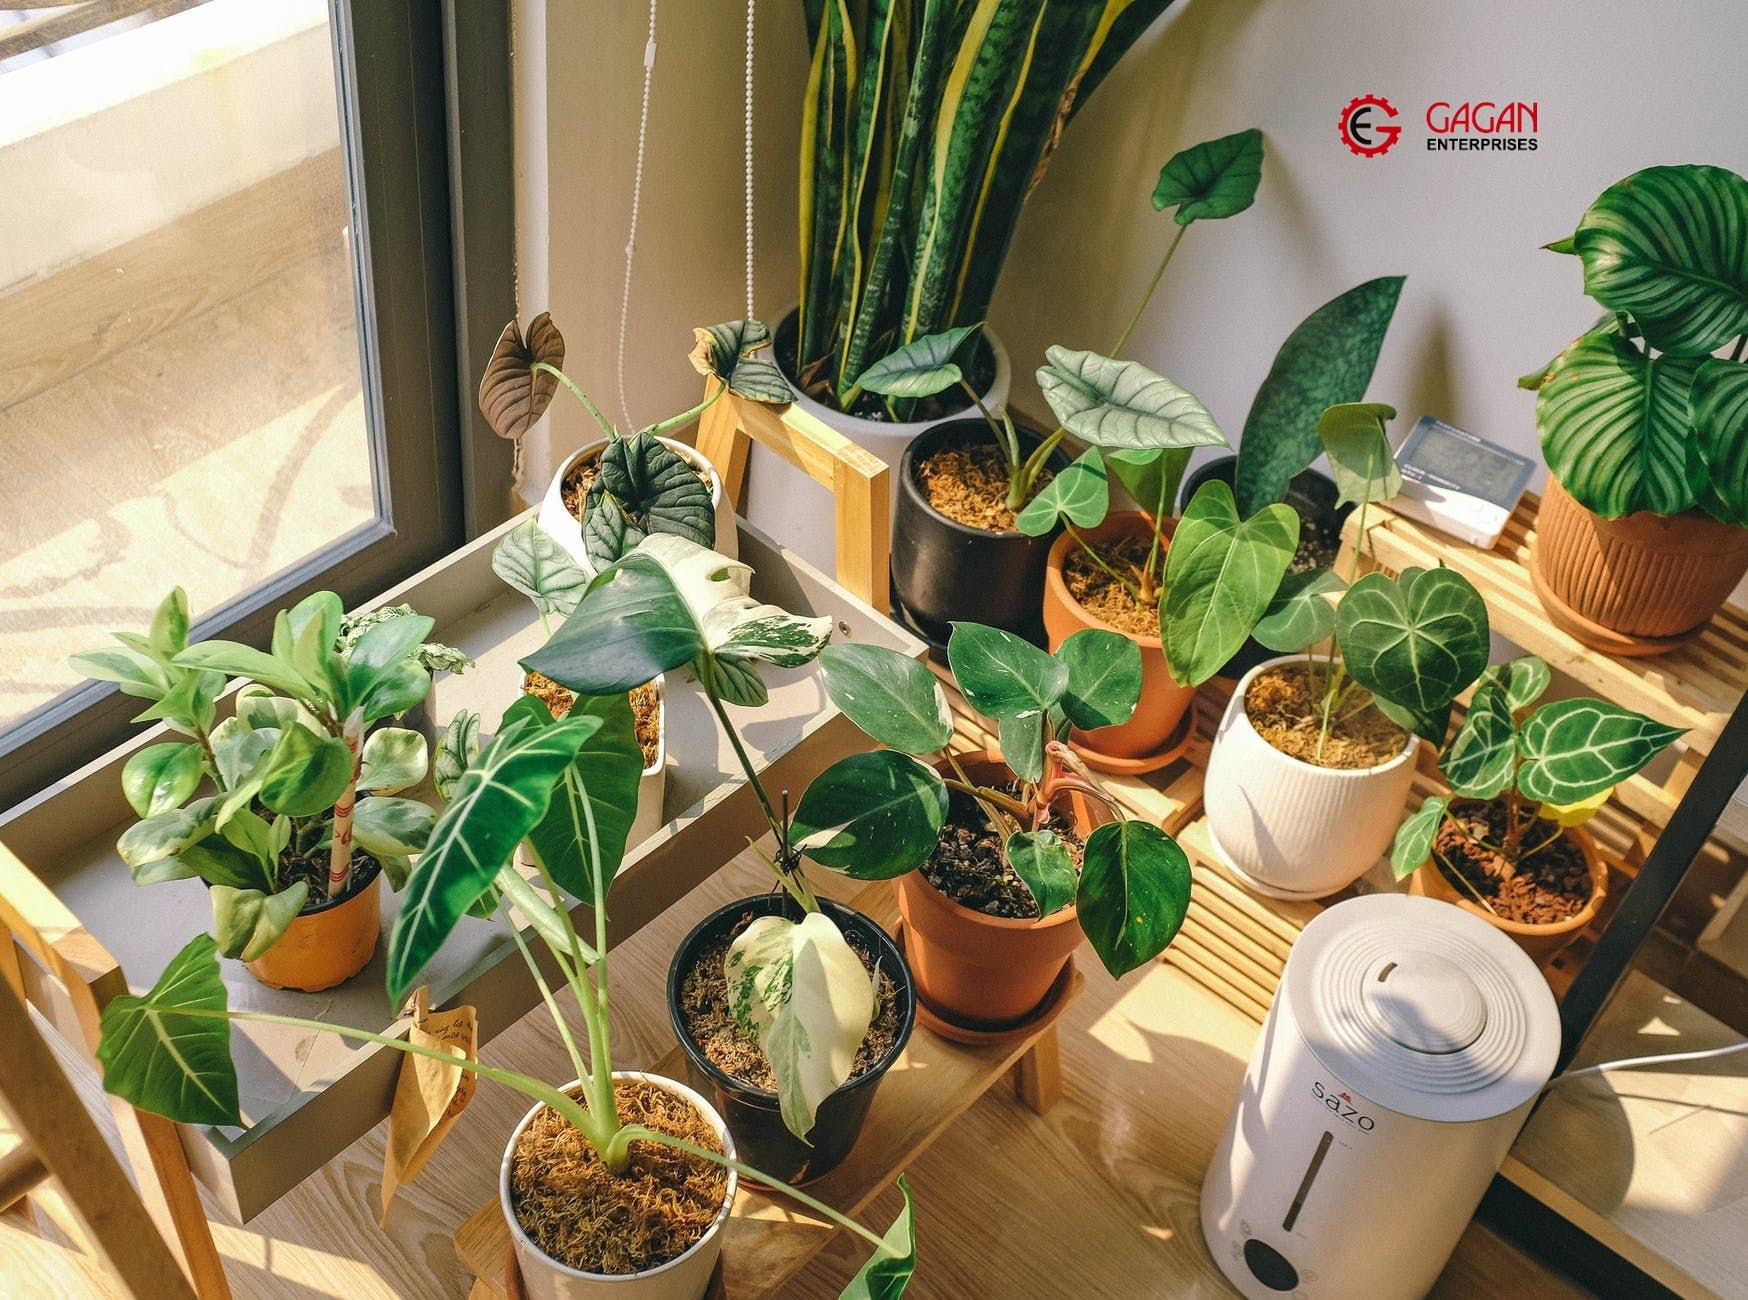 plant stand ideas for balcony Gagan Enterprises Ludhiana